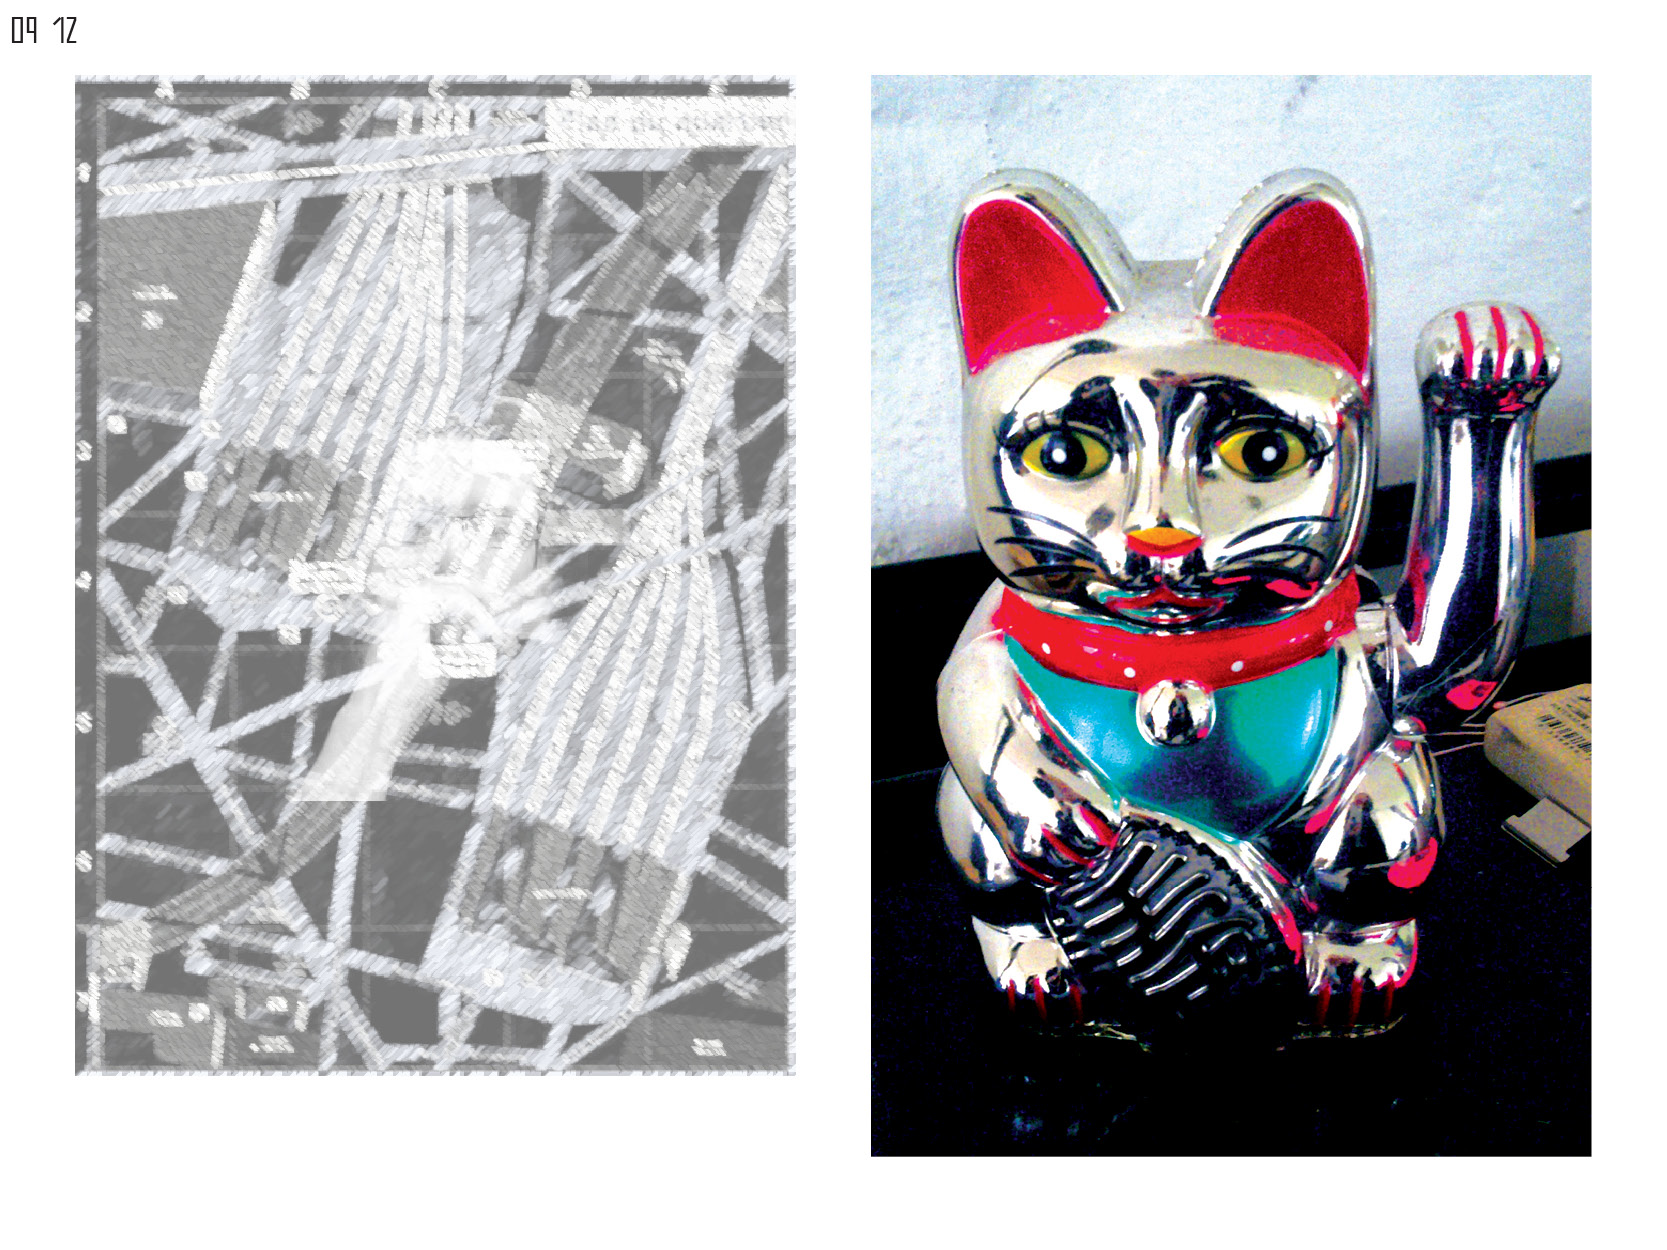 Gerrit-Schweiger-Dialog-Städte-Paris-Berlin-Jessica-Blank-Experiment-Fotoserie-Tagebuch-visuelle-Kommunikation-50